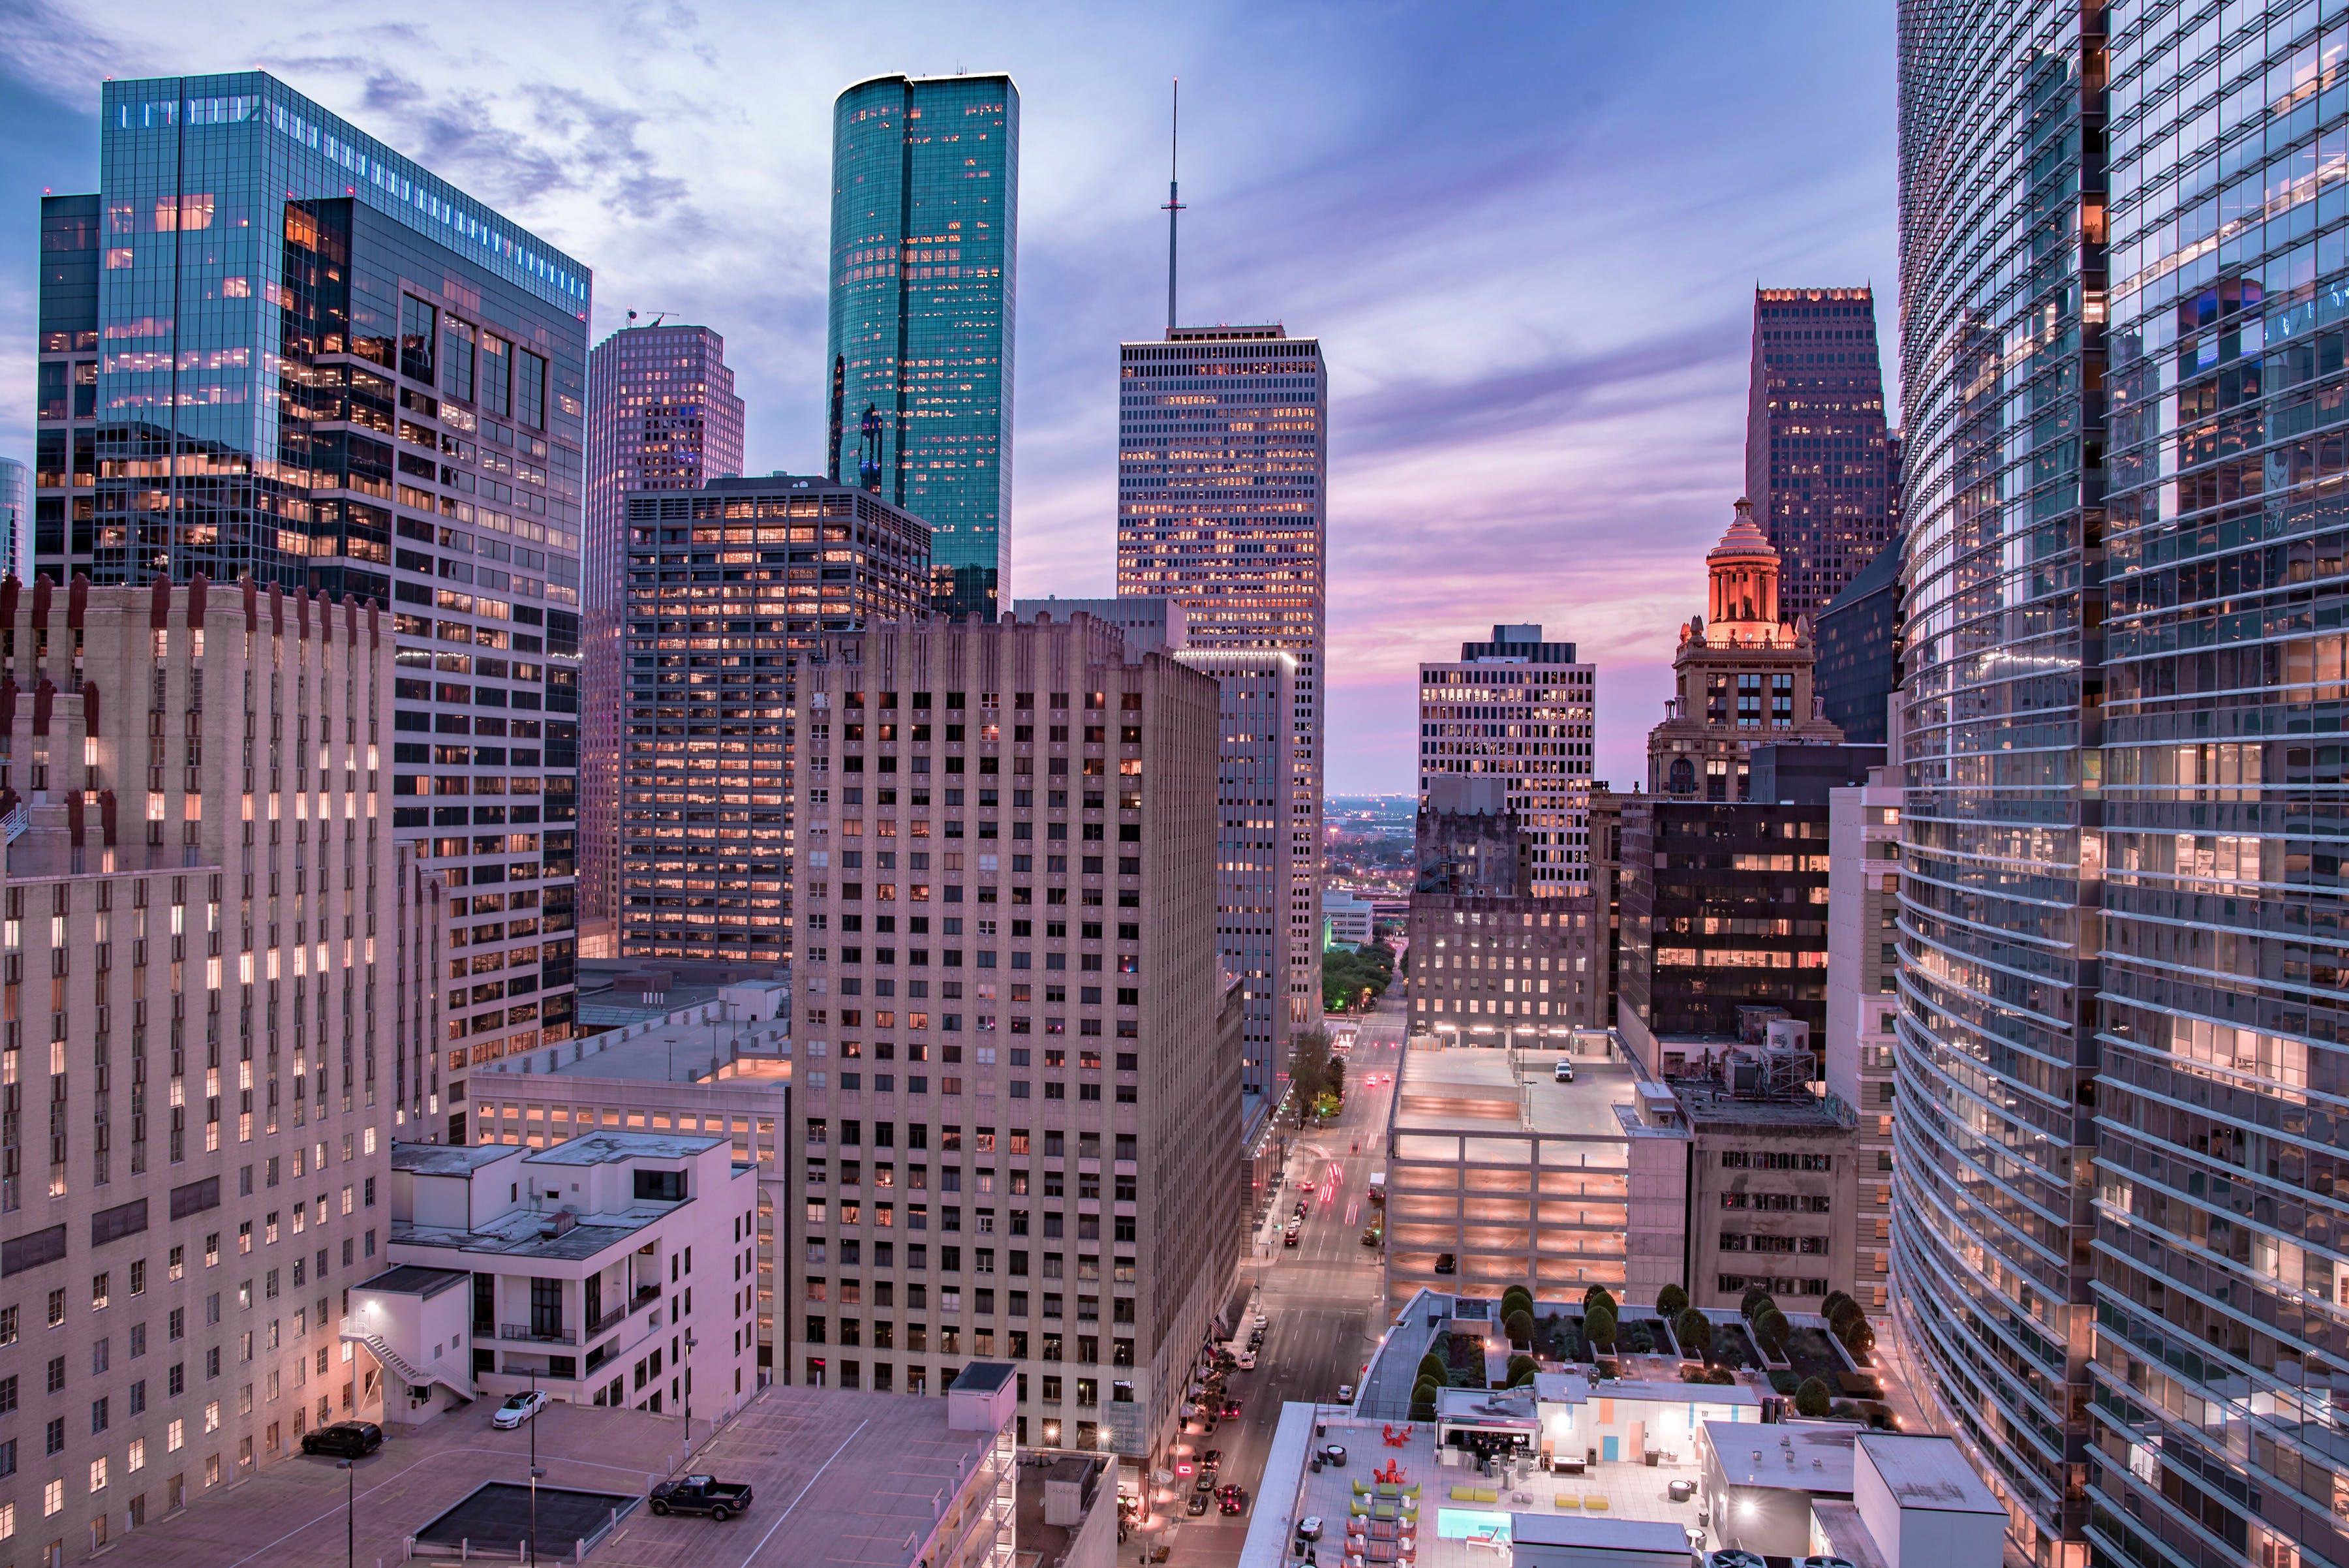 Rooms: Club Quarters Hotel In Houston